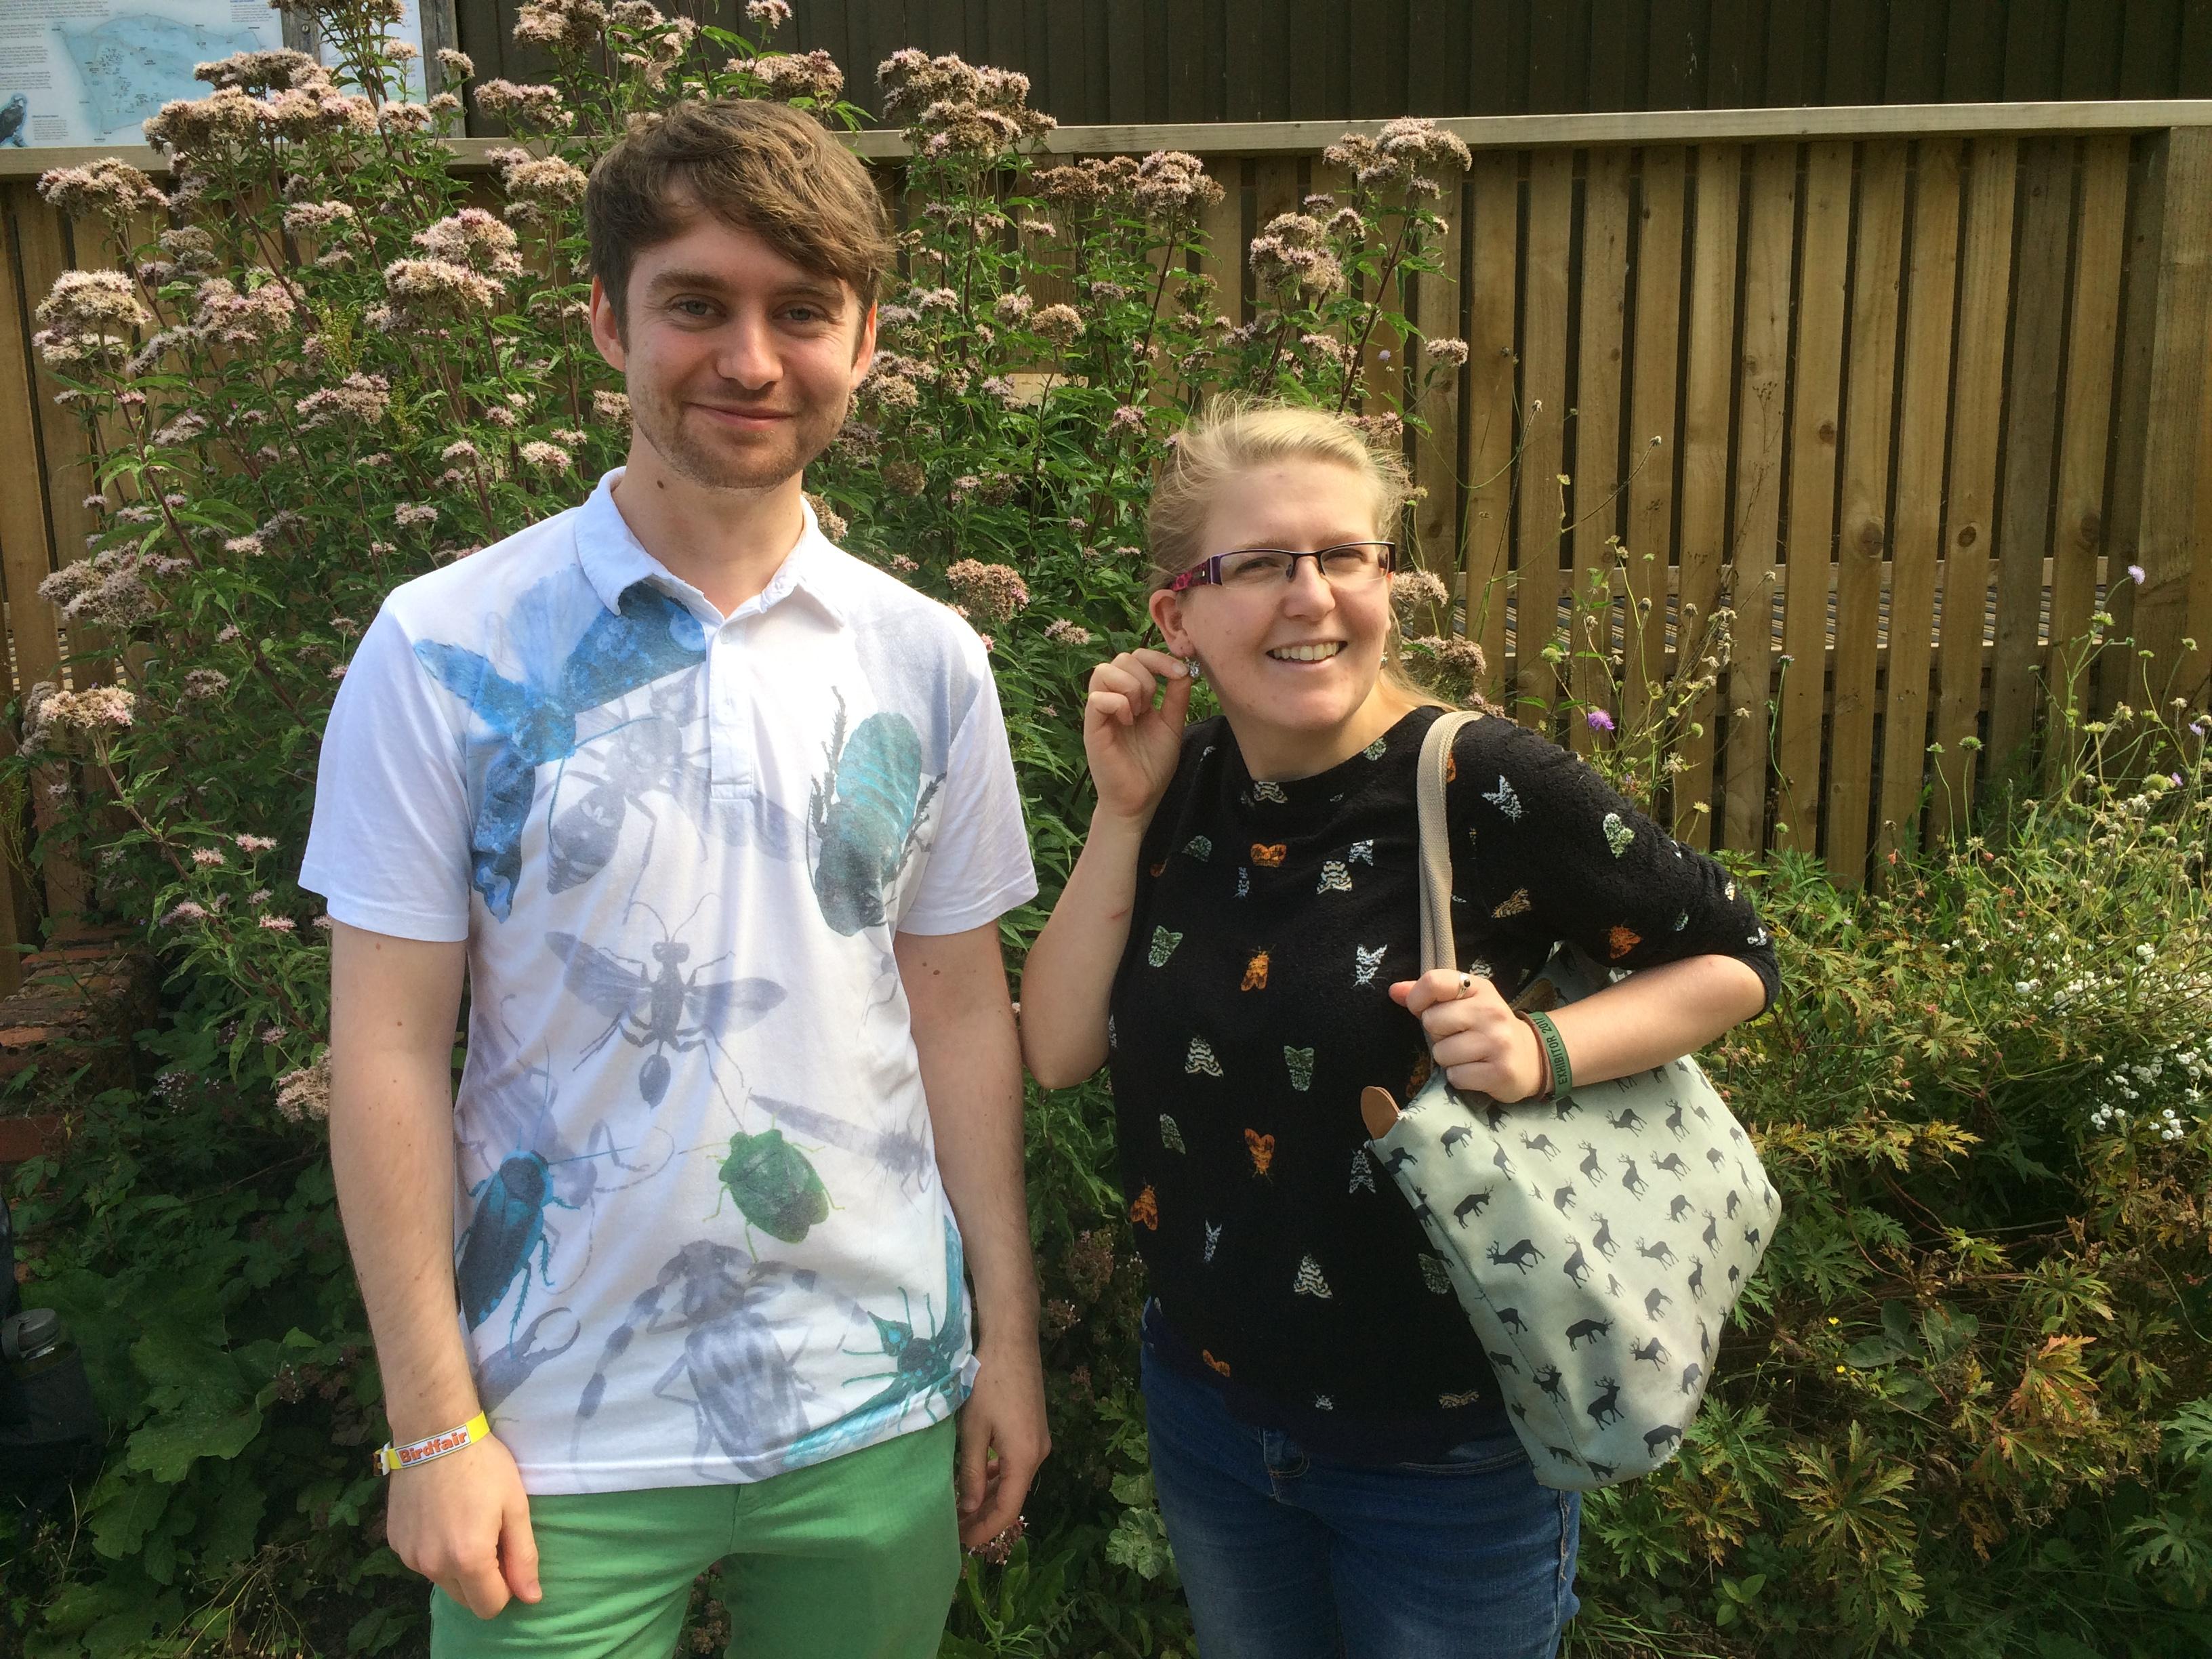 Adam Canning and Megan Shersby - Birdfair 2017